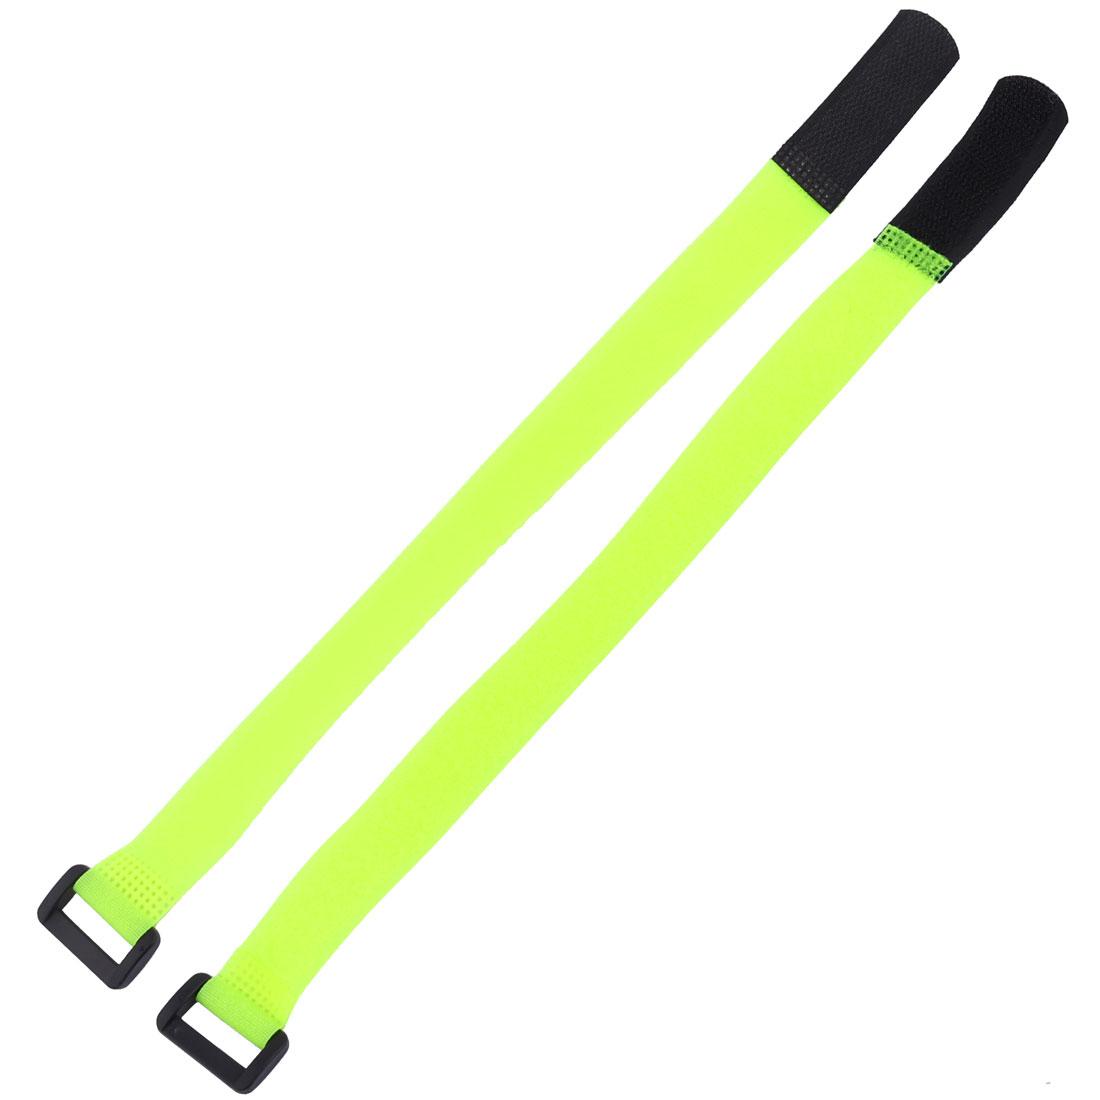 Sticky Hook Loop Adjustable Cable Ties Self Adhesive Fastener Light Yellow 2pcs